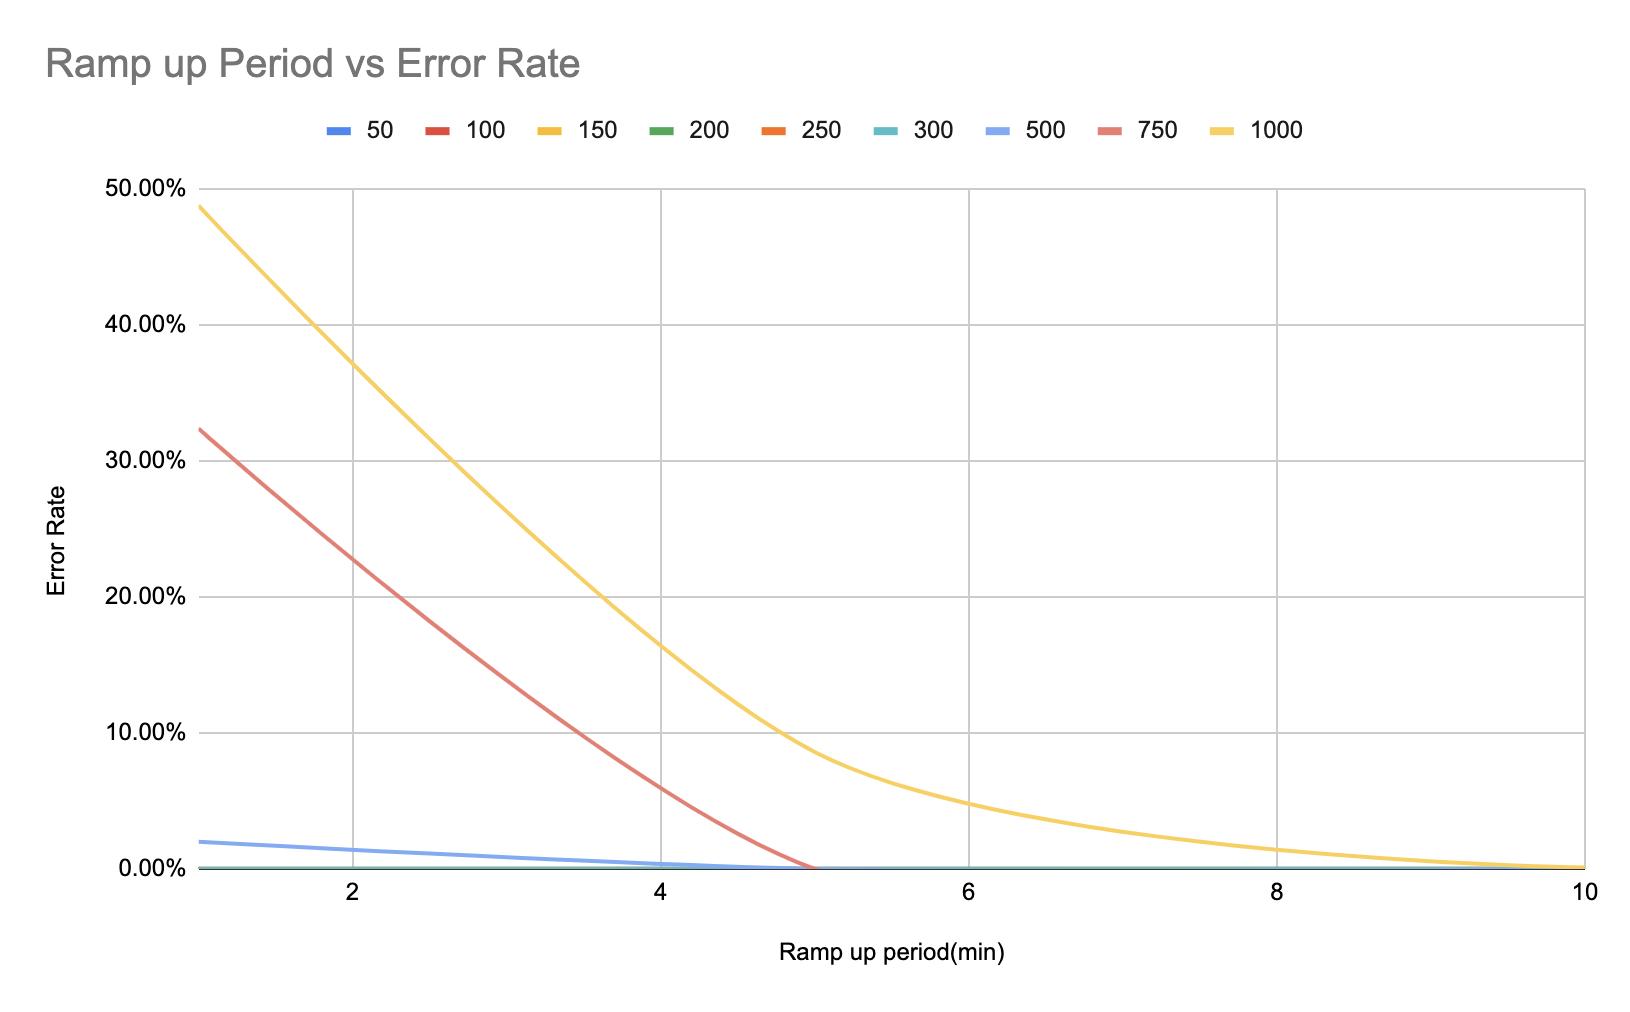 websocket_ramp_up_period_vs_error_rate